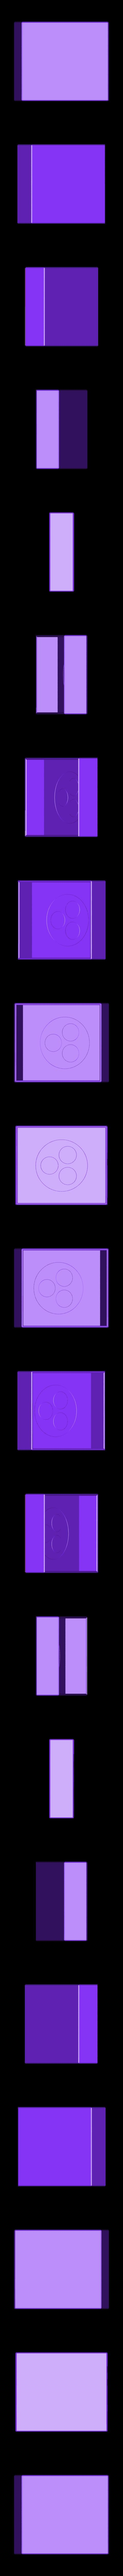 Lid.stl Download free STL file 6-Piece Burr Puzzle - Set of 42 pieces • 3D printable model, ChampystileCorp